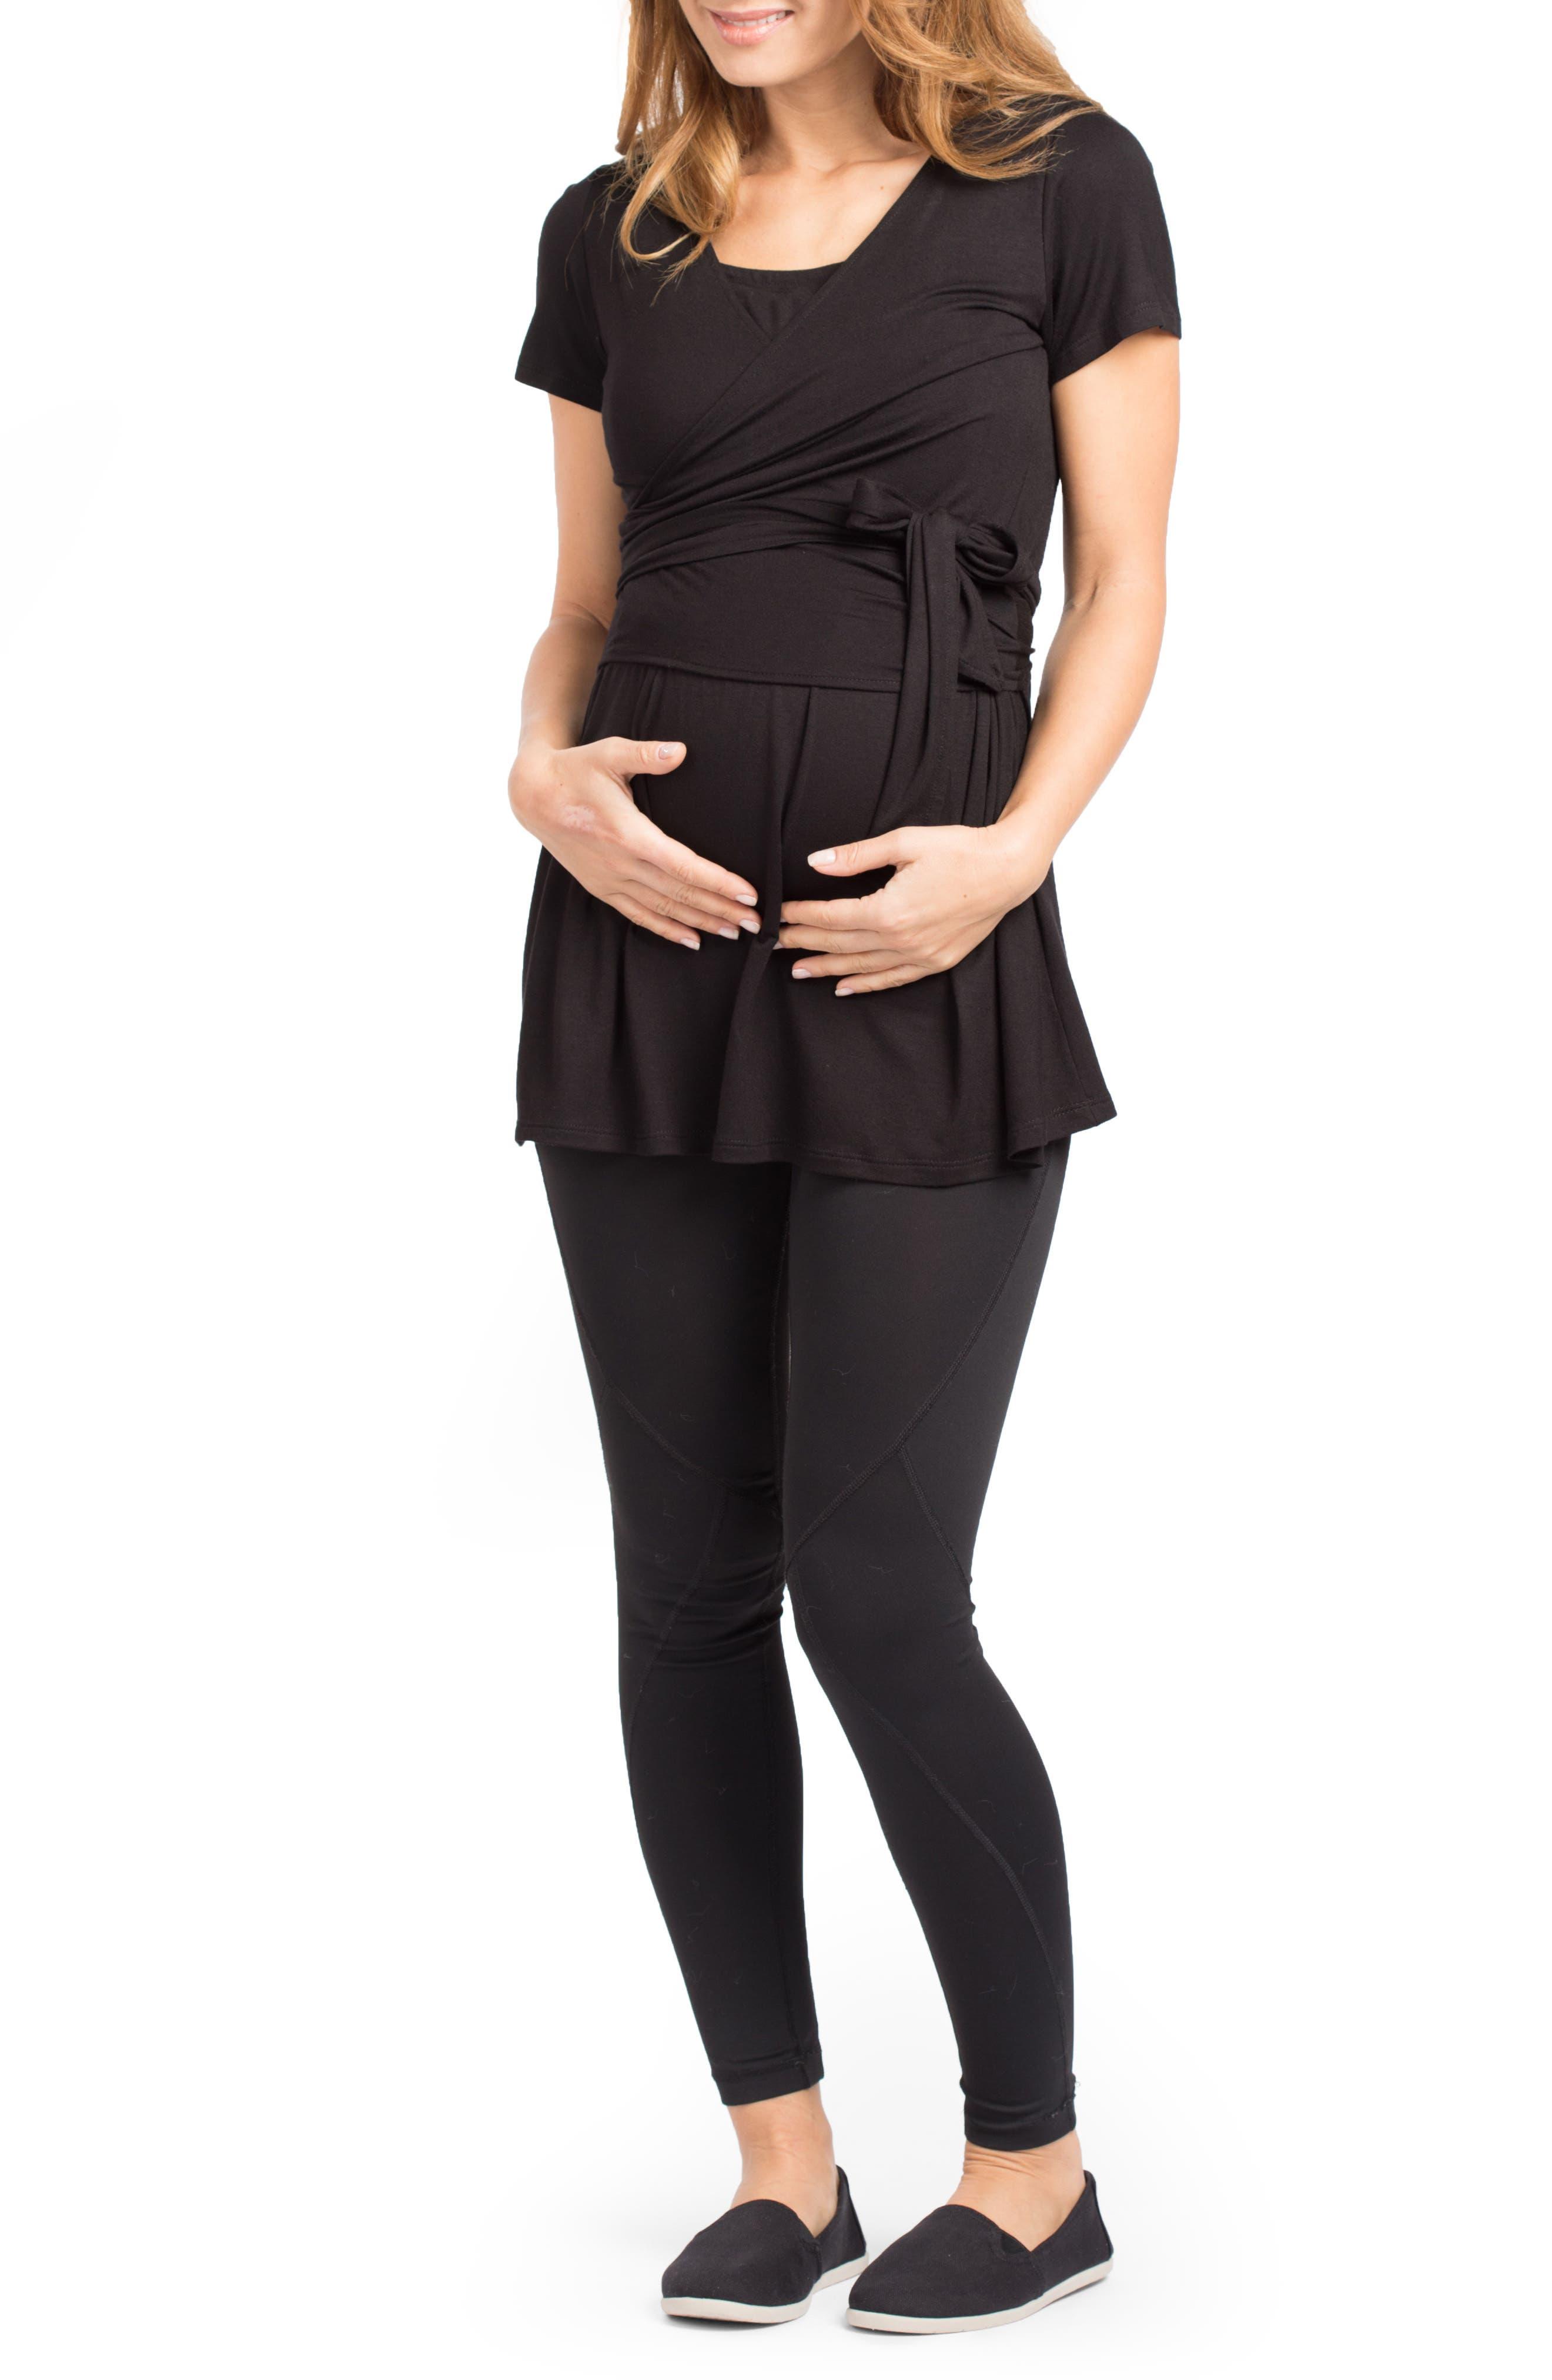 Pasadena Wrap Maternity Tunic,                             Main thumbnail 1, color,                             BLACK